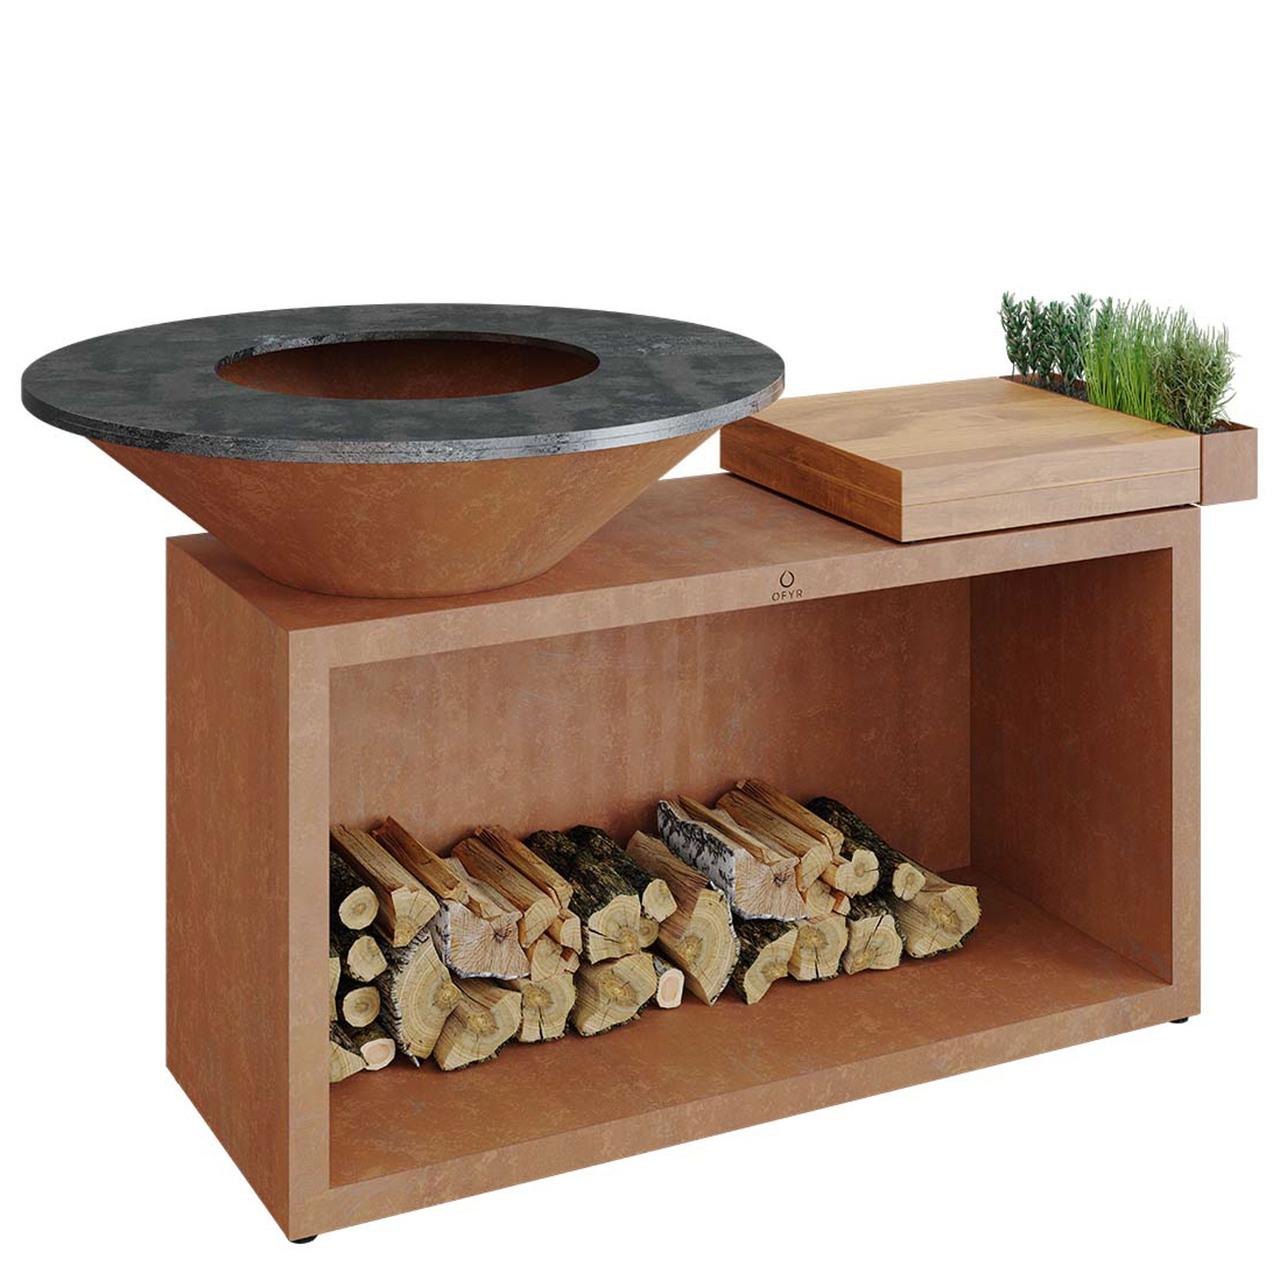 Ofyr Grill-Outdoorkücheninsel 'Cooking Unit Island' Ø: 98 cm, Corten-Stahl, Teakholz